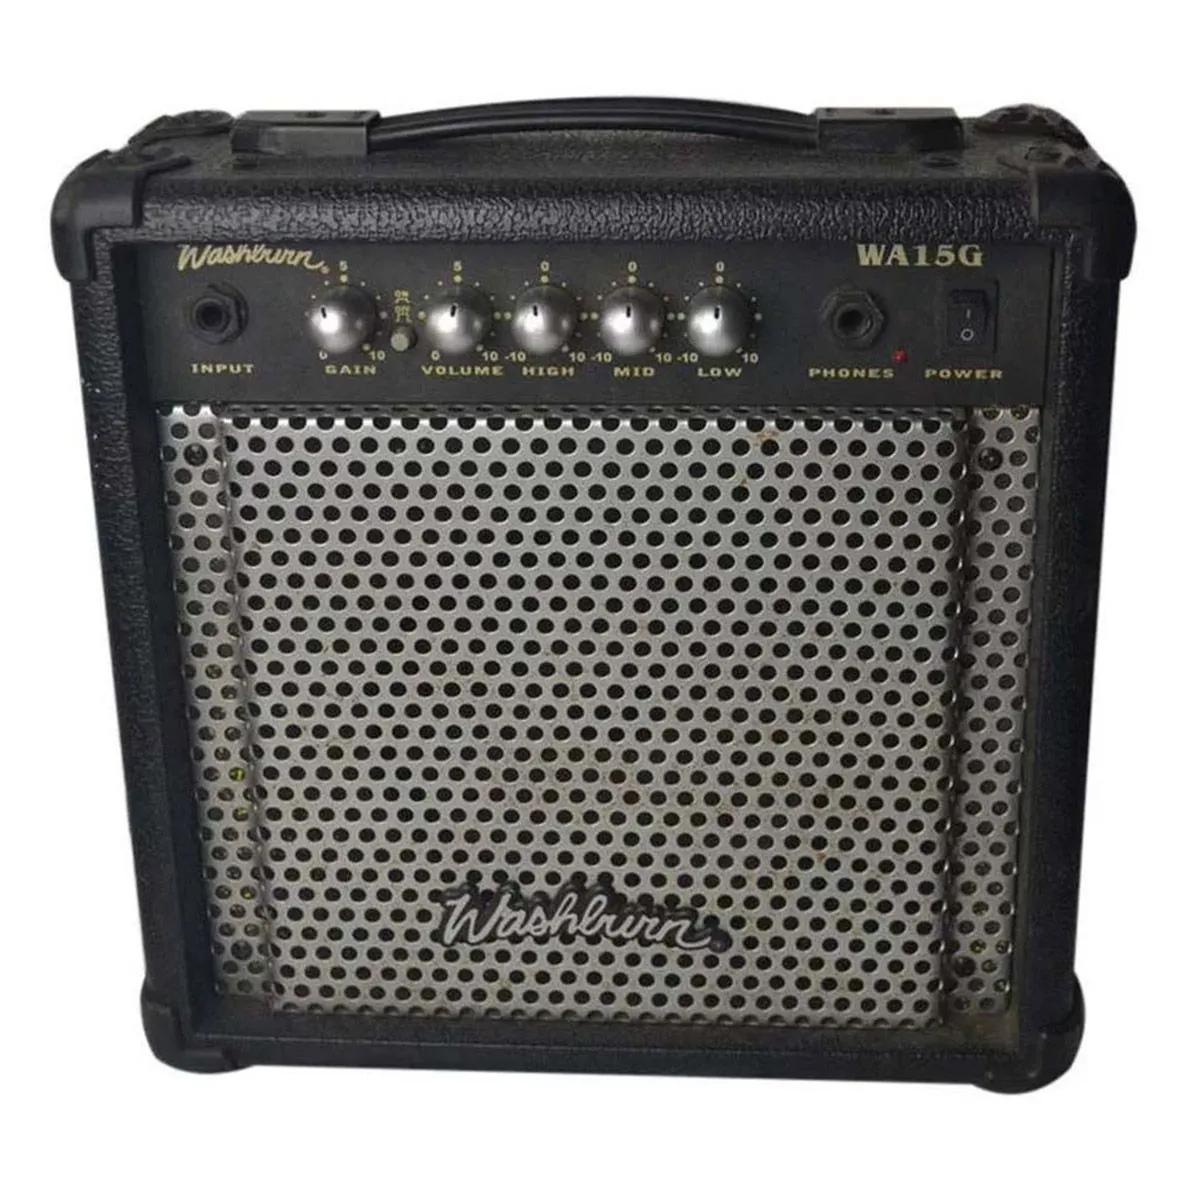 Amplificador Washburn WA15G 1x15 15w para Guitarra